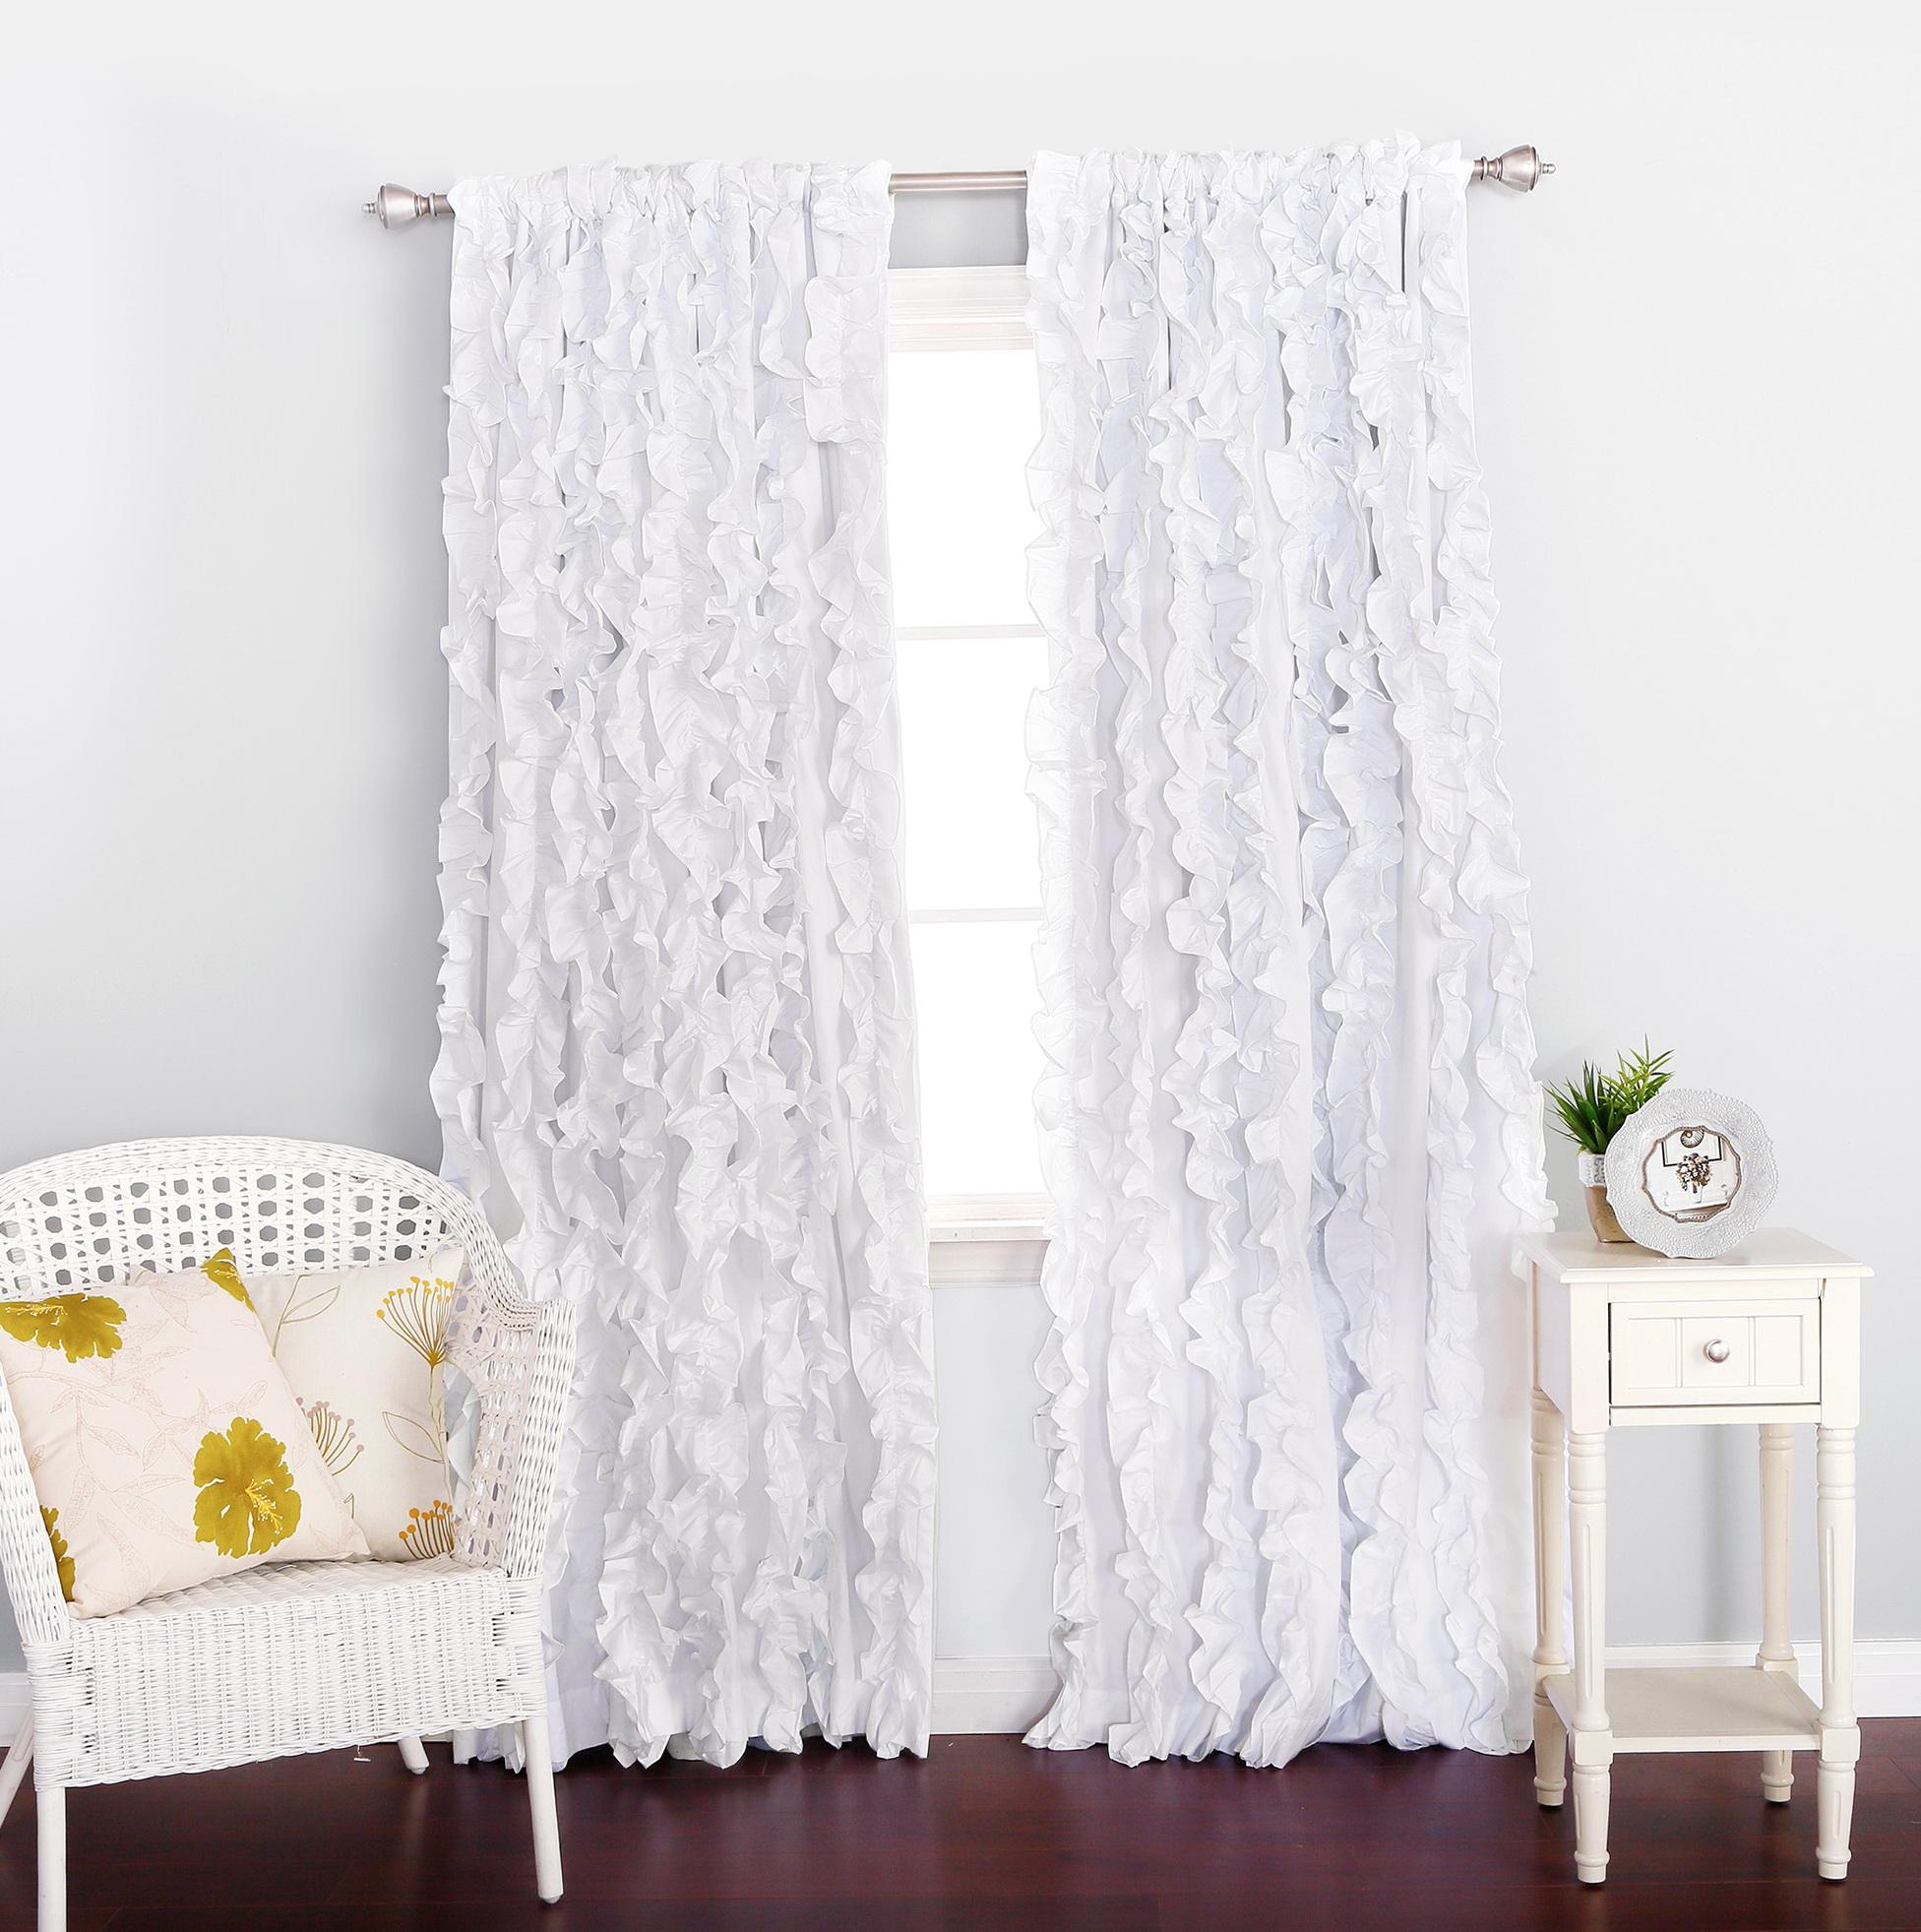 White Ruffle Blackout Curtains Home Design Ideas